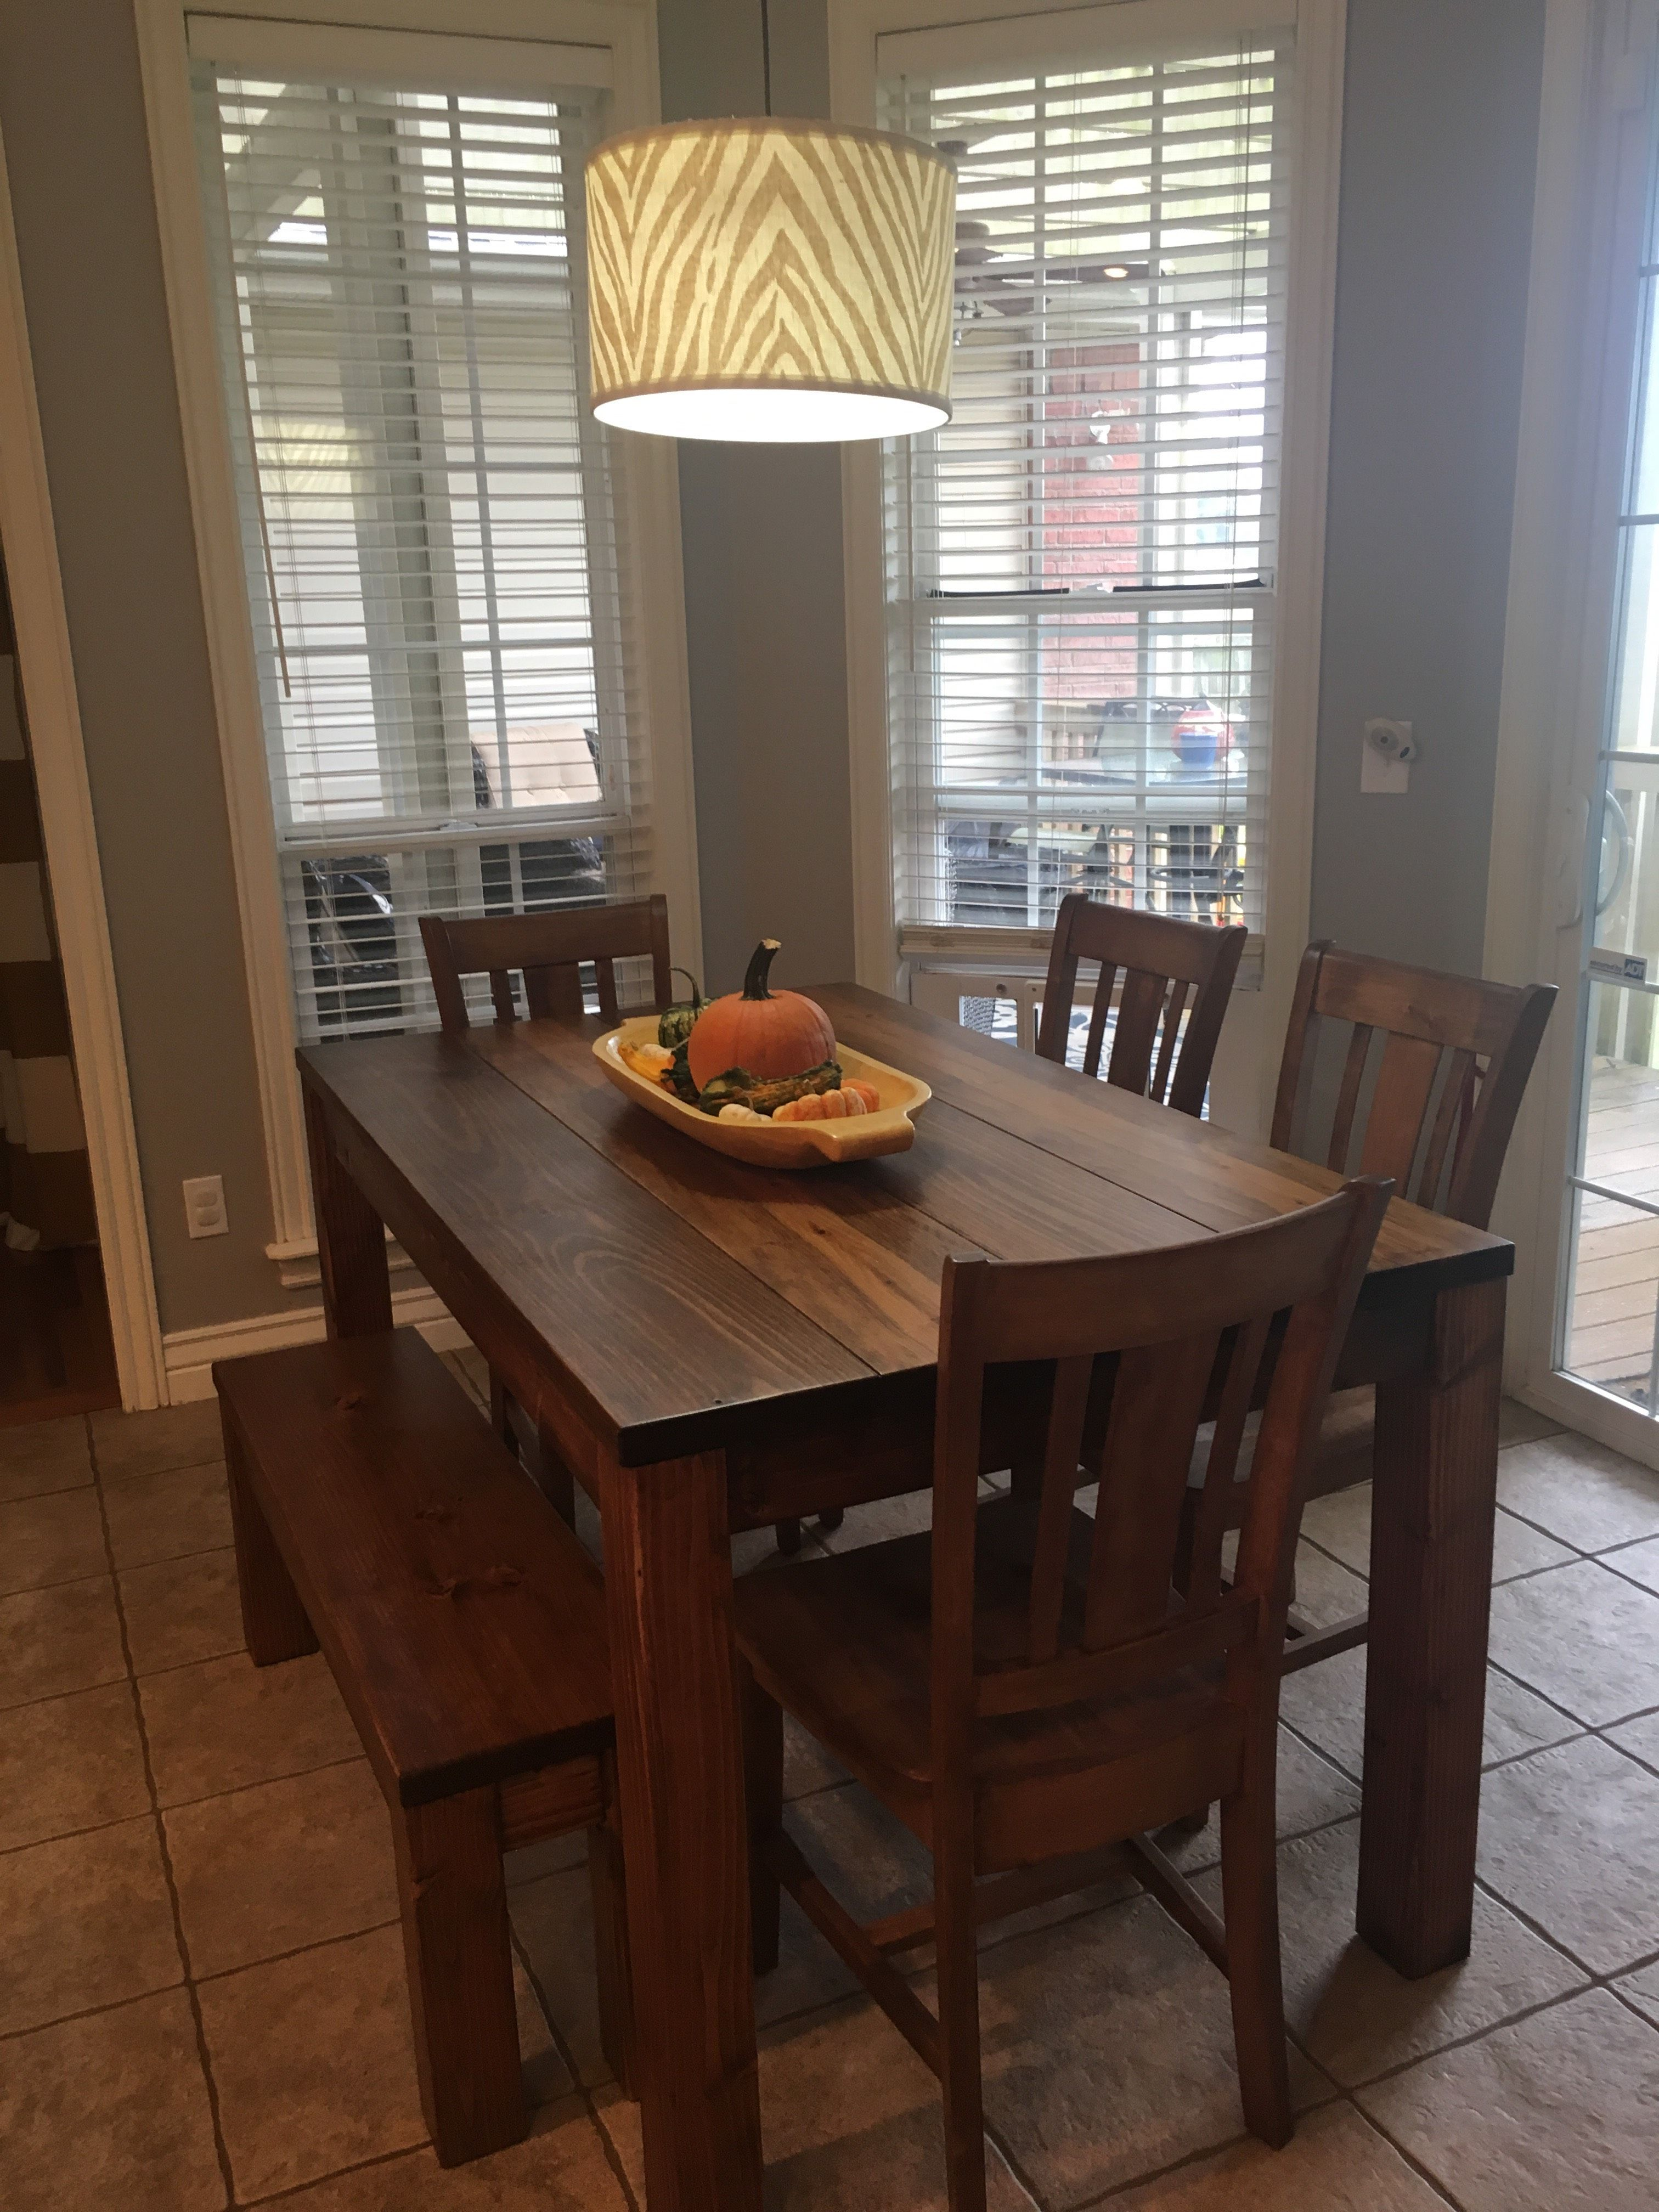 This Custom Parsons Table is 5u0027 L